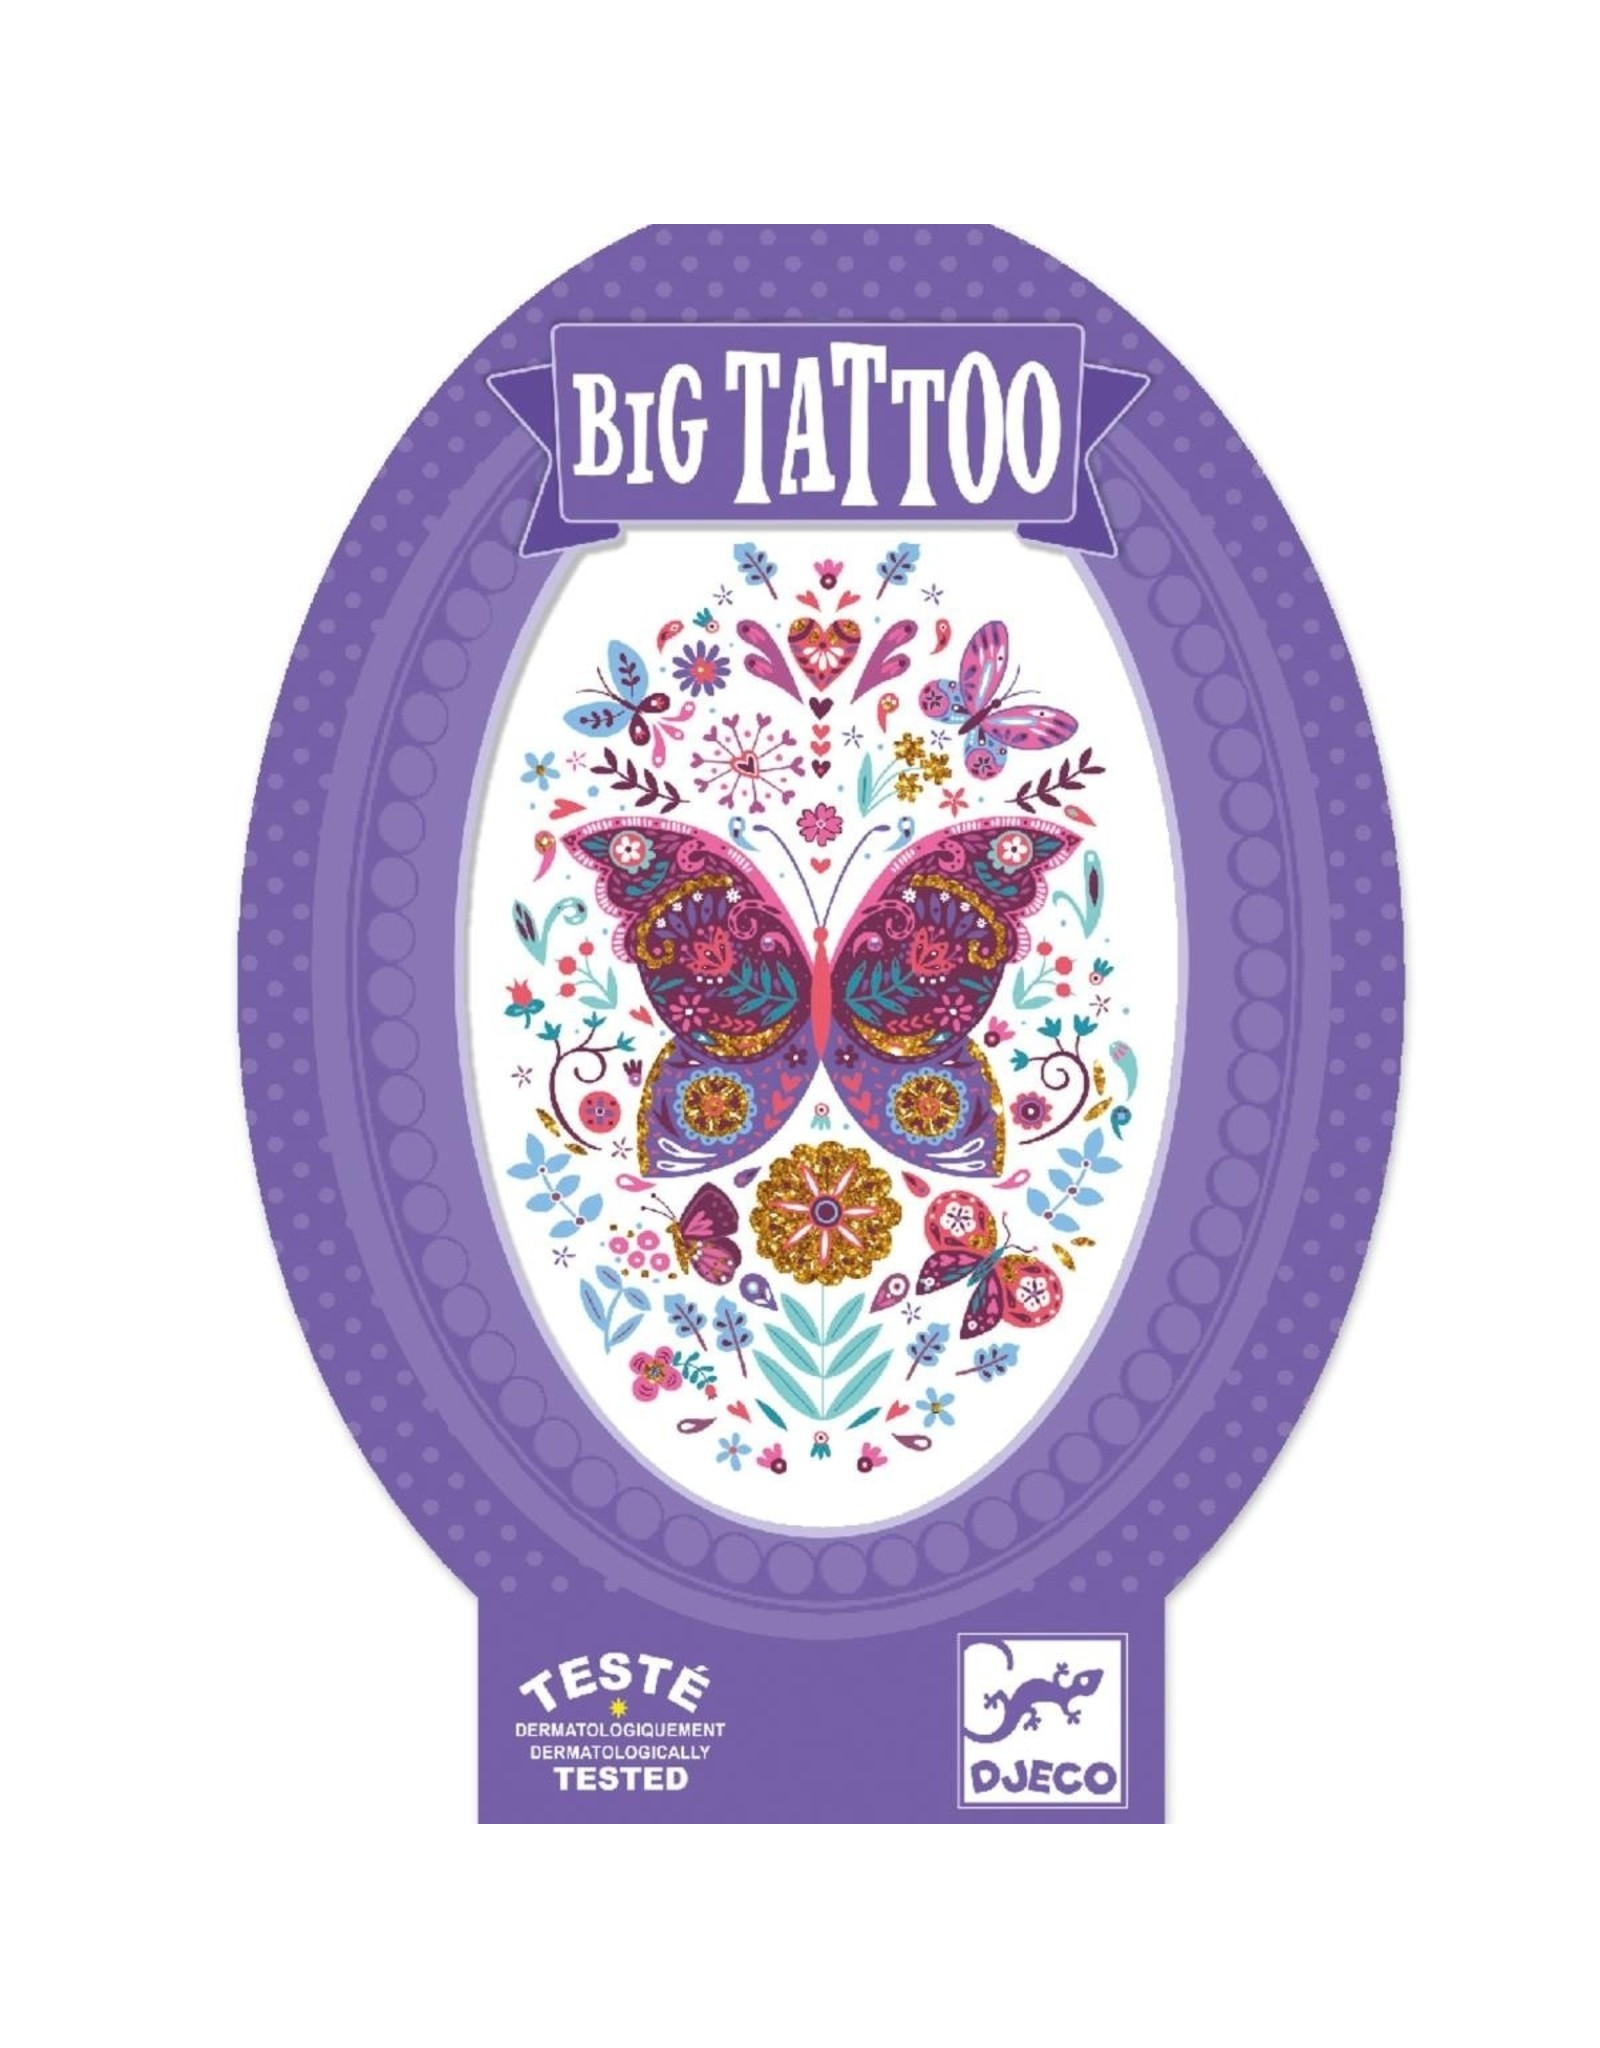 Djeco Butterfly Metallic Big Tattoo